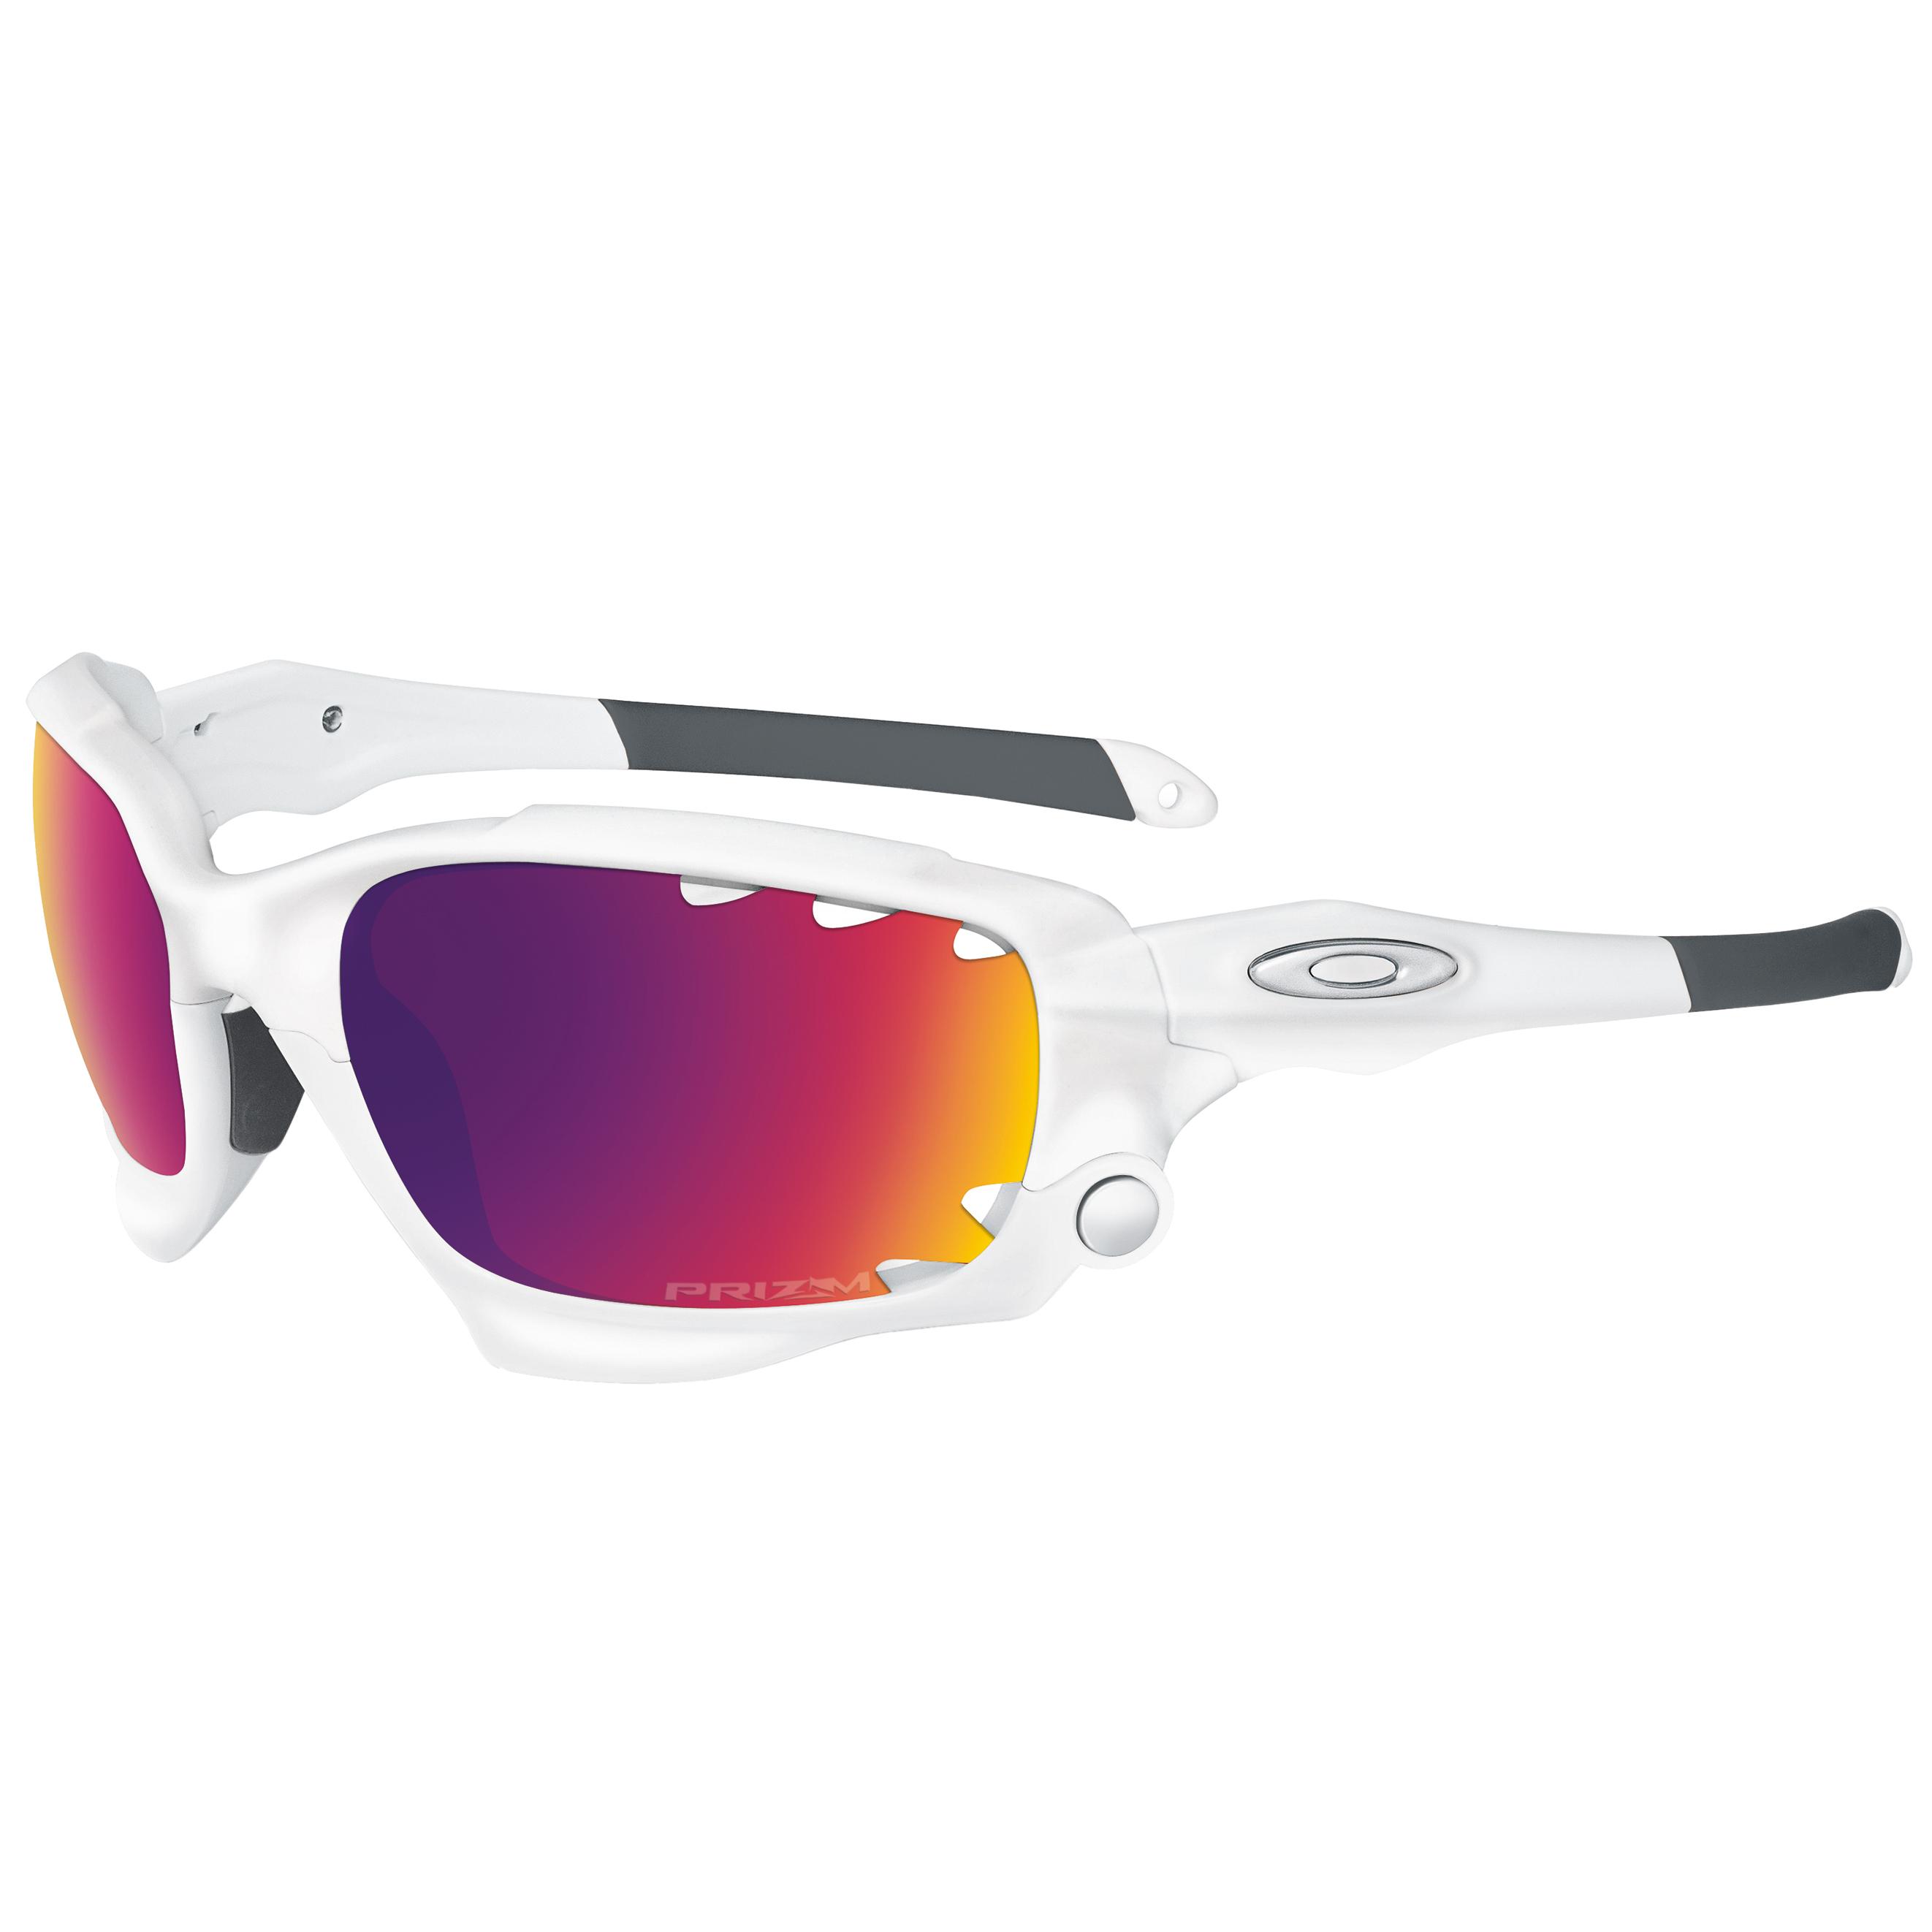 Oakley Racing Jacket Sunglasses - Unisex 3948d35b2940